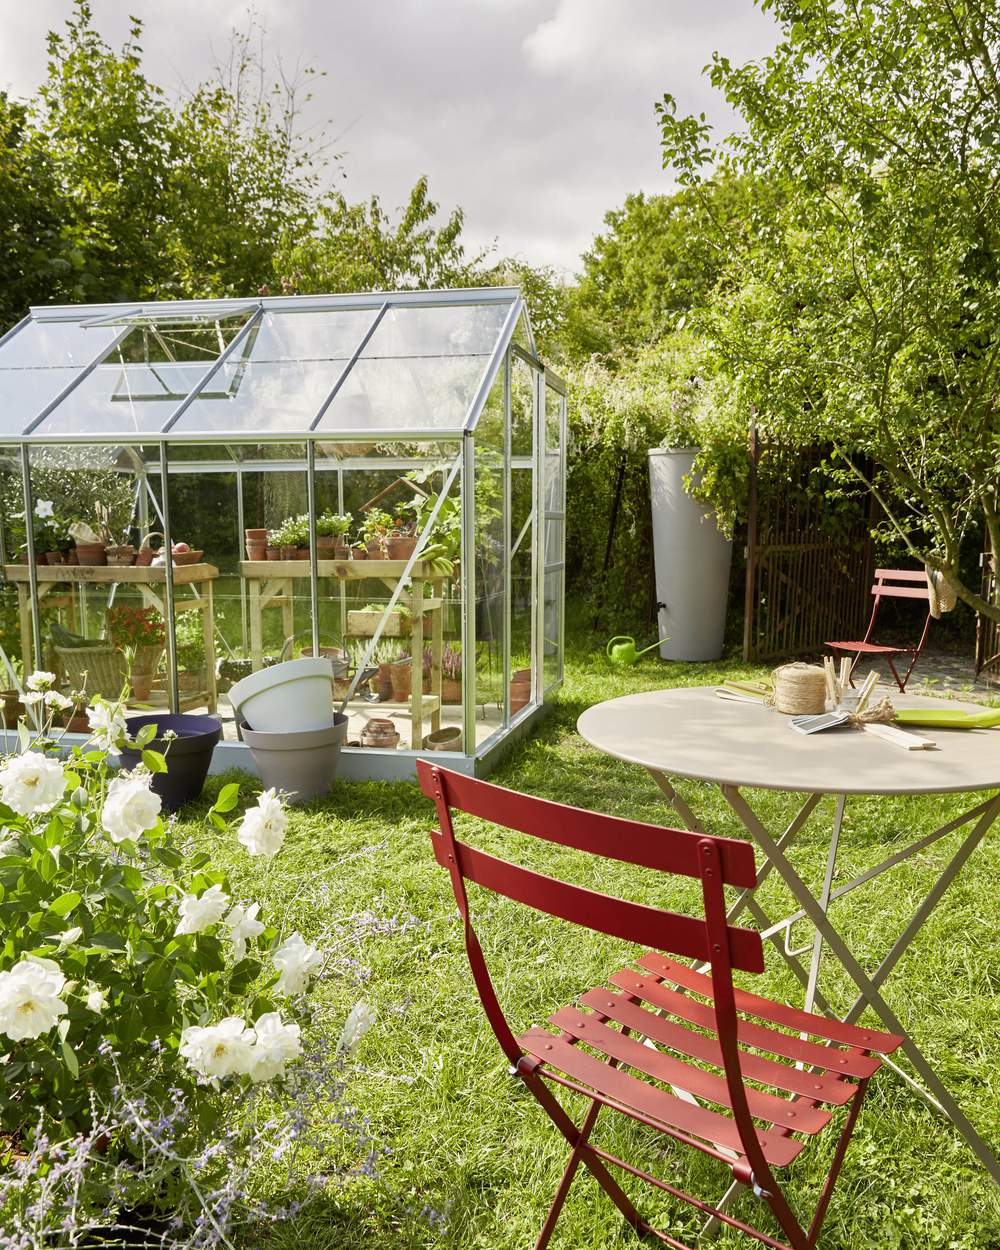 Serre De Jardin Adossee Sur Mesure Dbg Classics | Serre De ... encequiconcerne Serres De Jardin Castorama